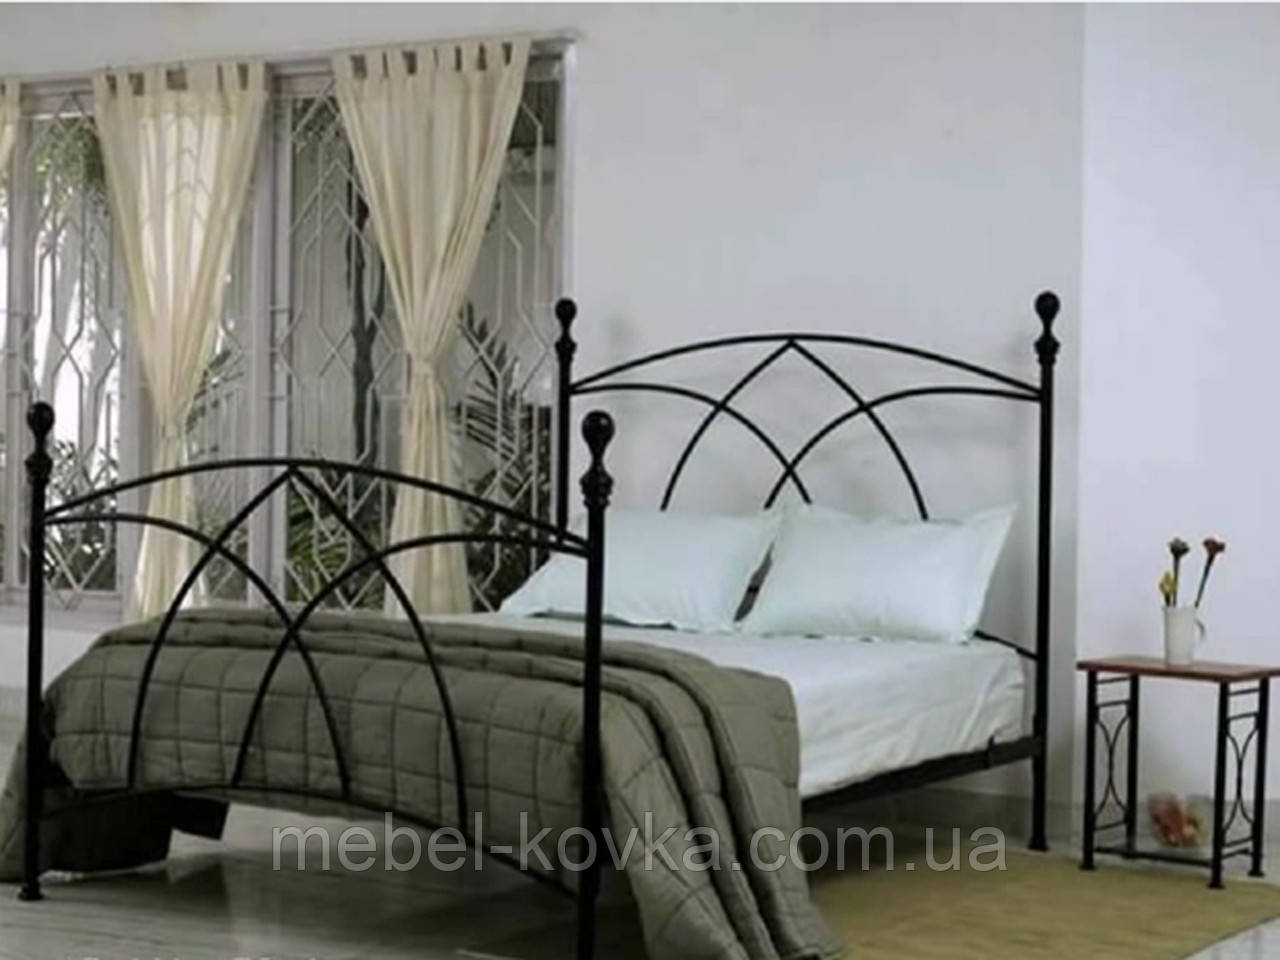 Ліжко коване 34 160х200